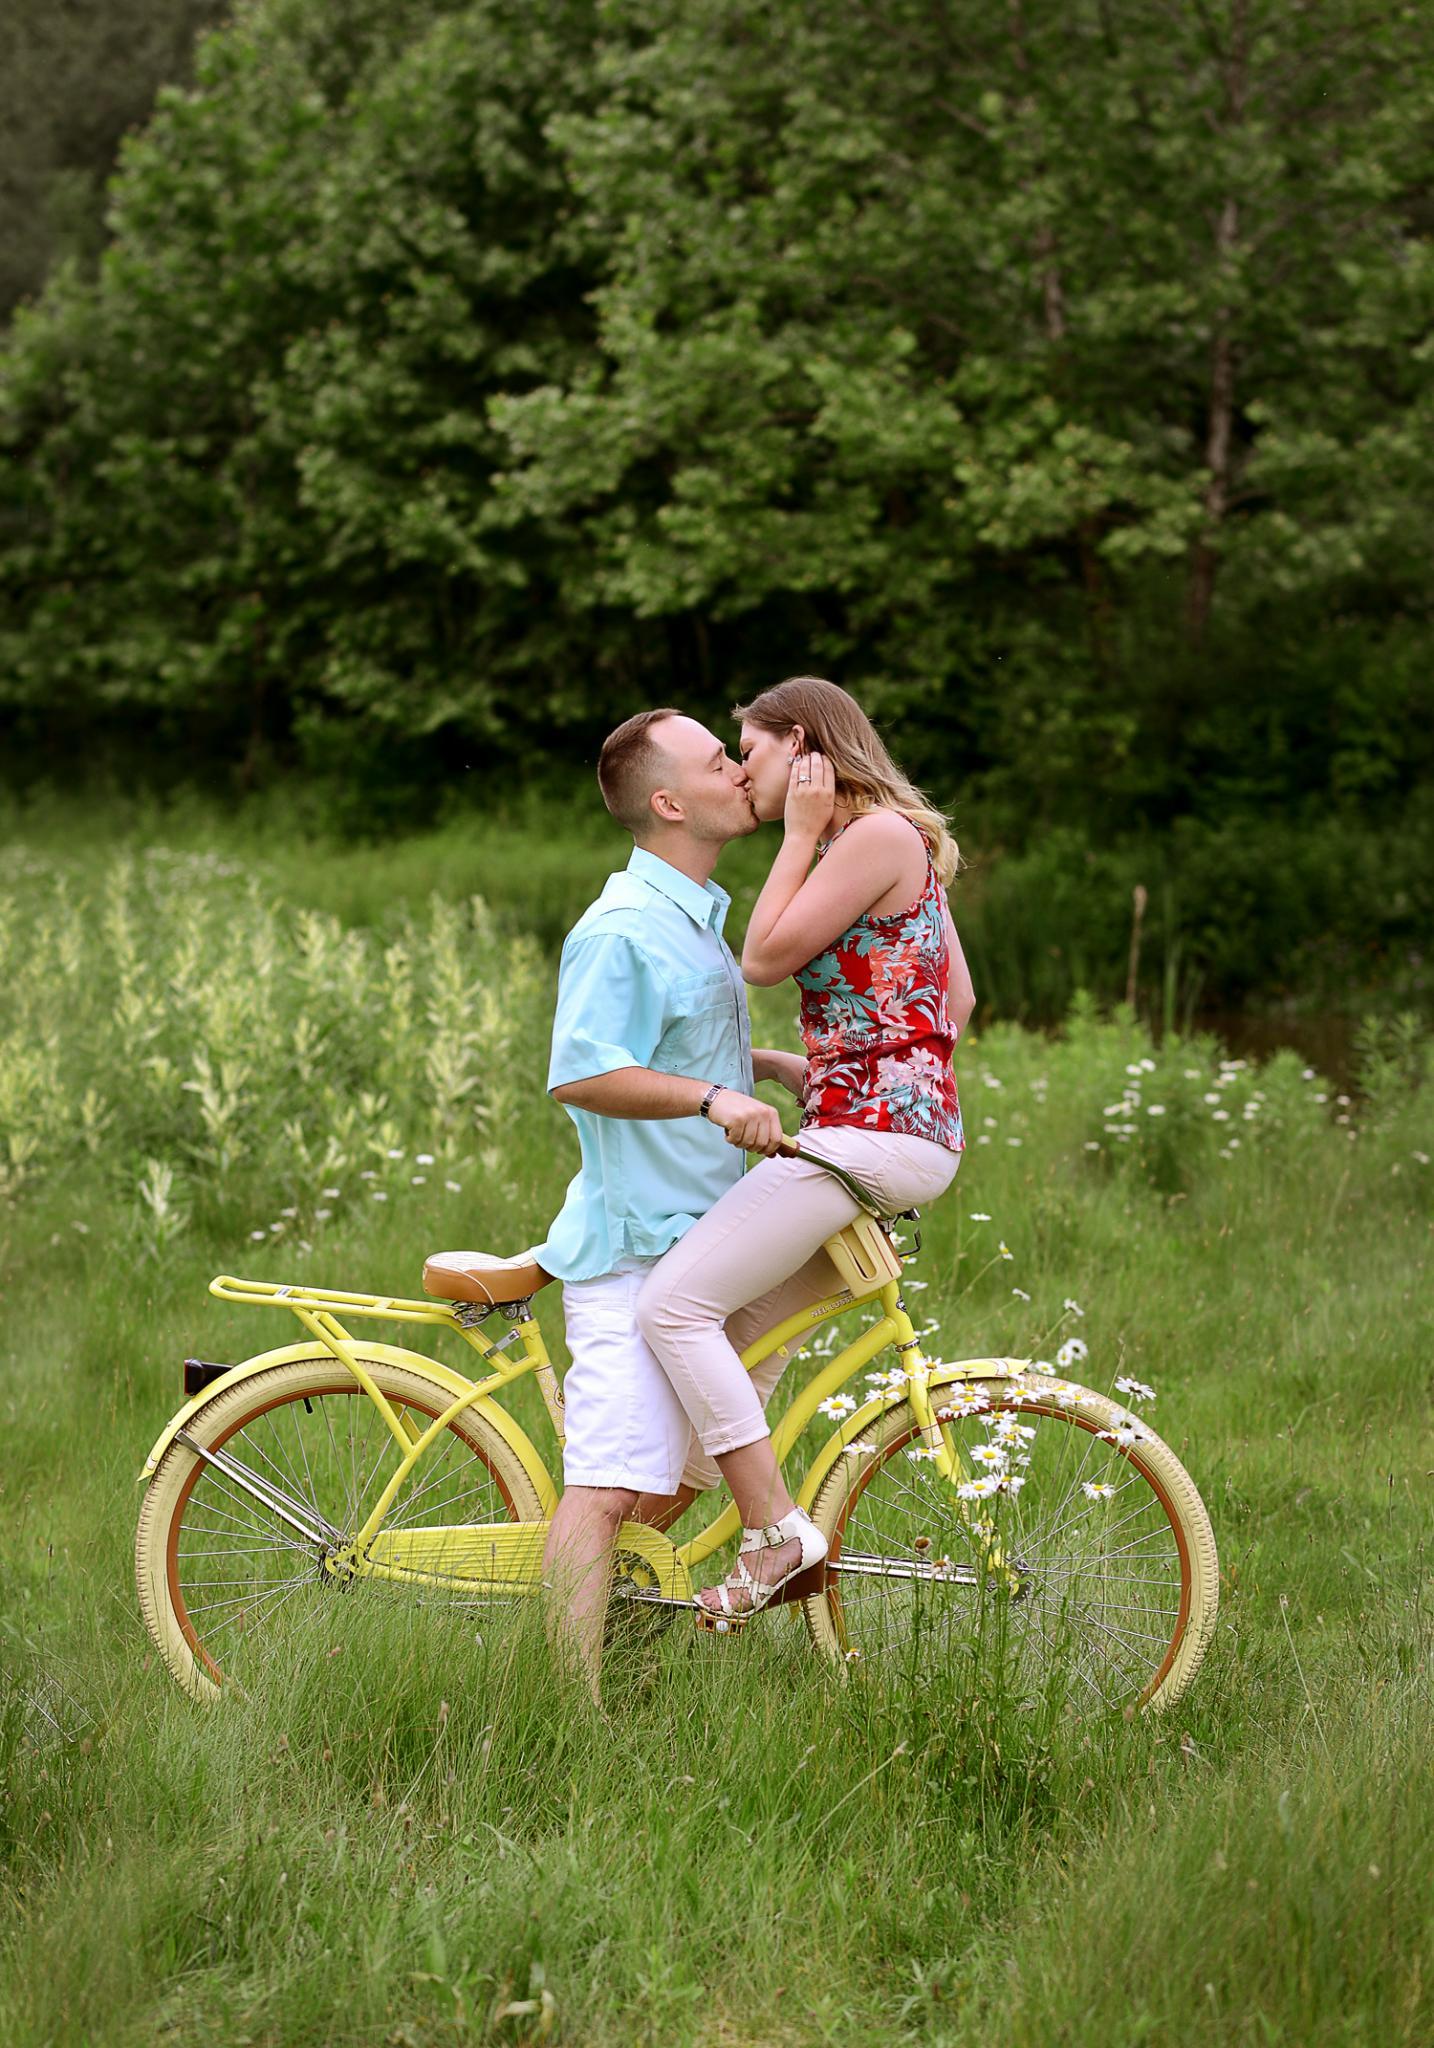 Danielle & Logan | Engagement Session Mill Creek Park | Cinderella Bridge | Lake Newport Wetlands | Youngstown Wedding Photographer